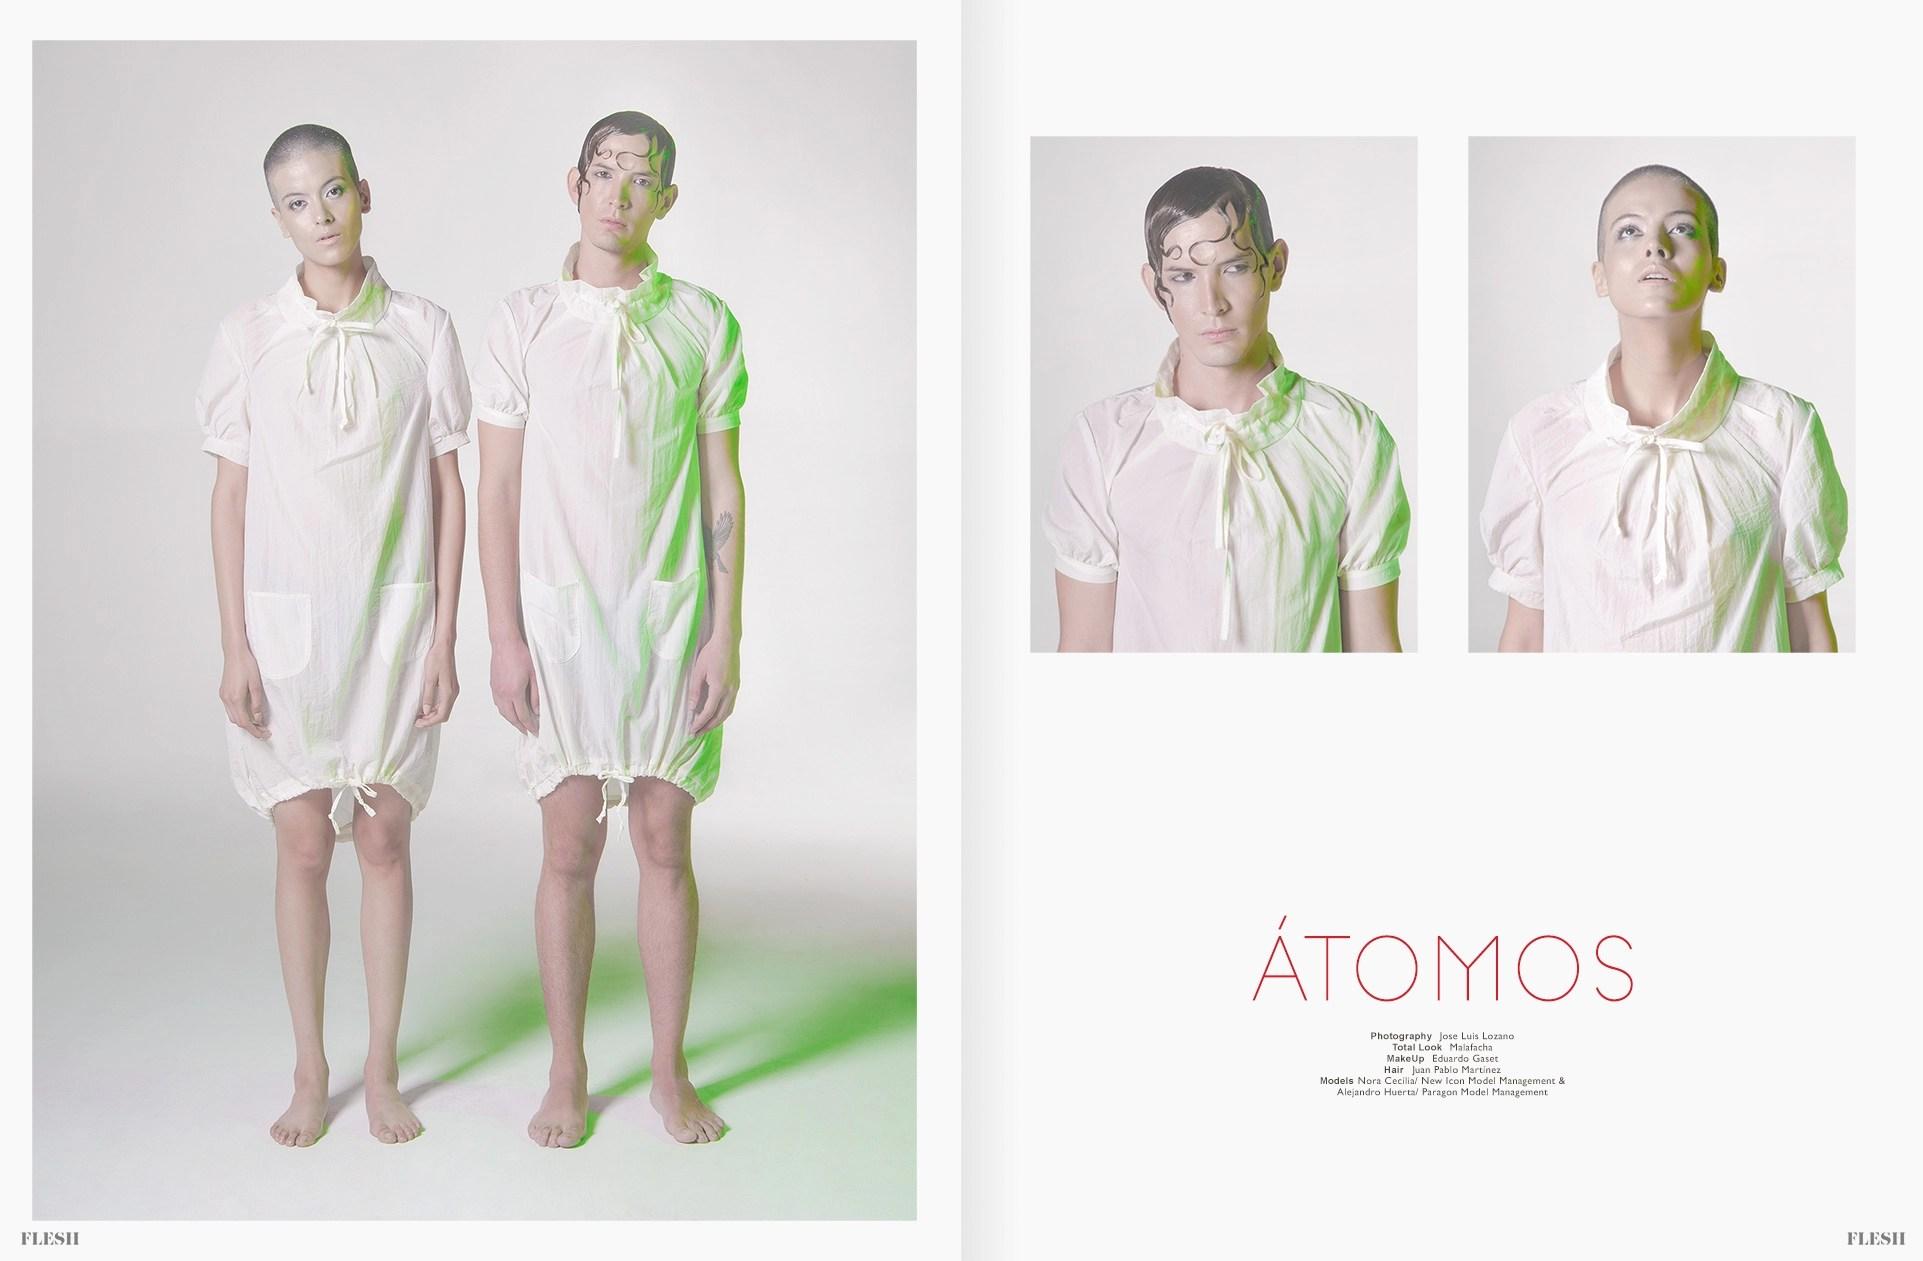 Atomos PHOTO Jose Luis Lozano, Total Look MALAFACHA, MakeUp Eduardo Gaset, Hair Juan Pablo Martinez